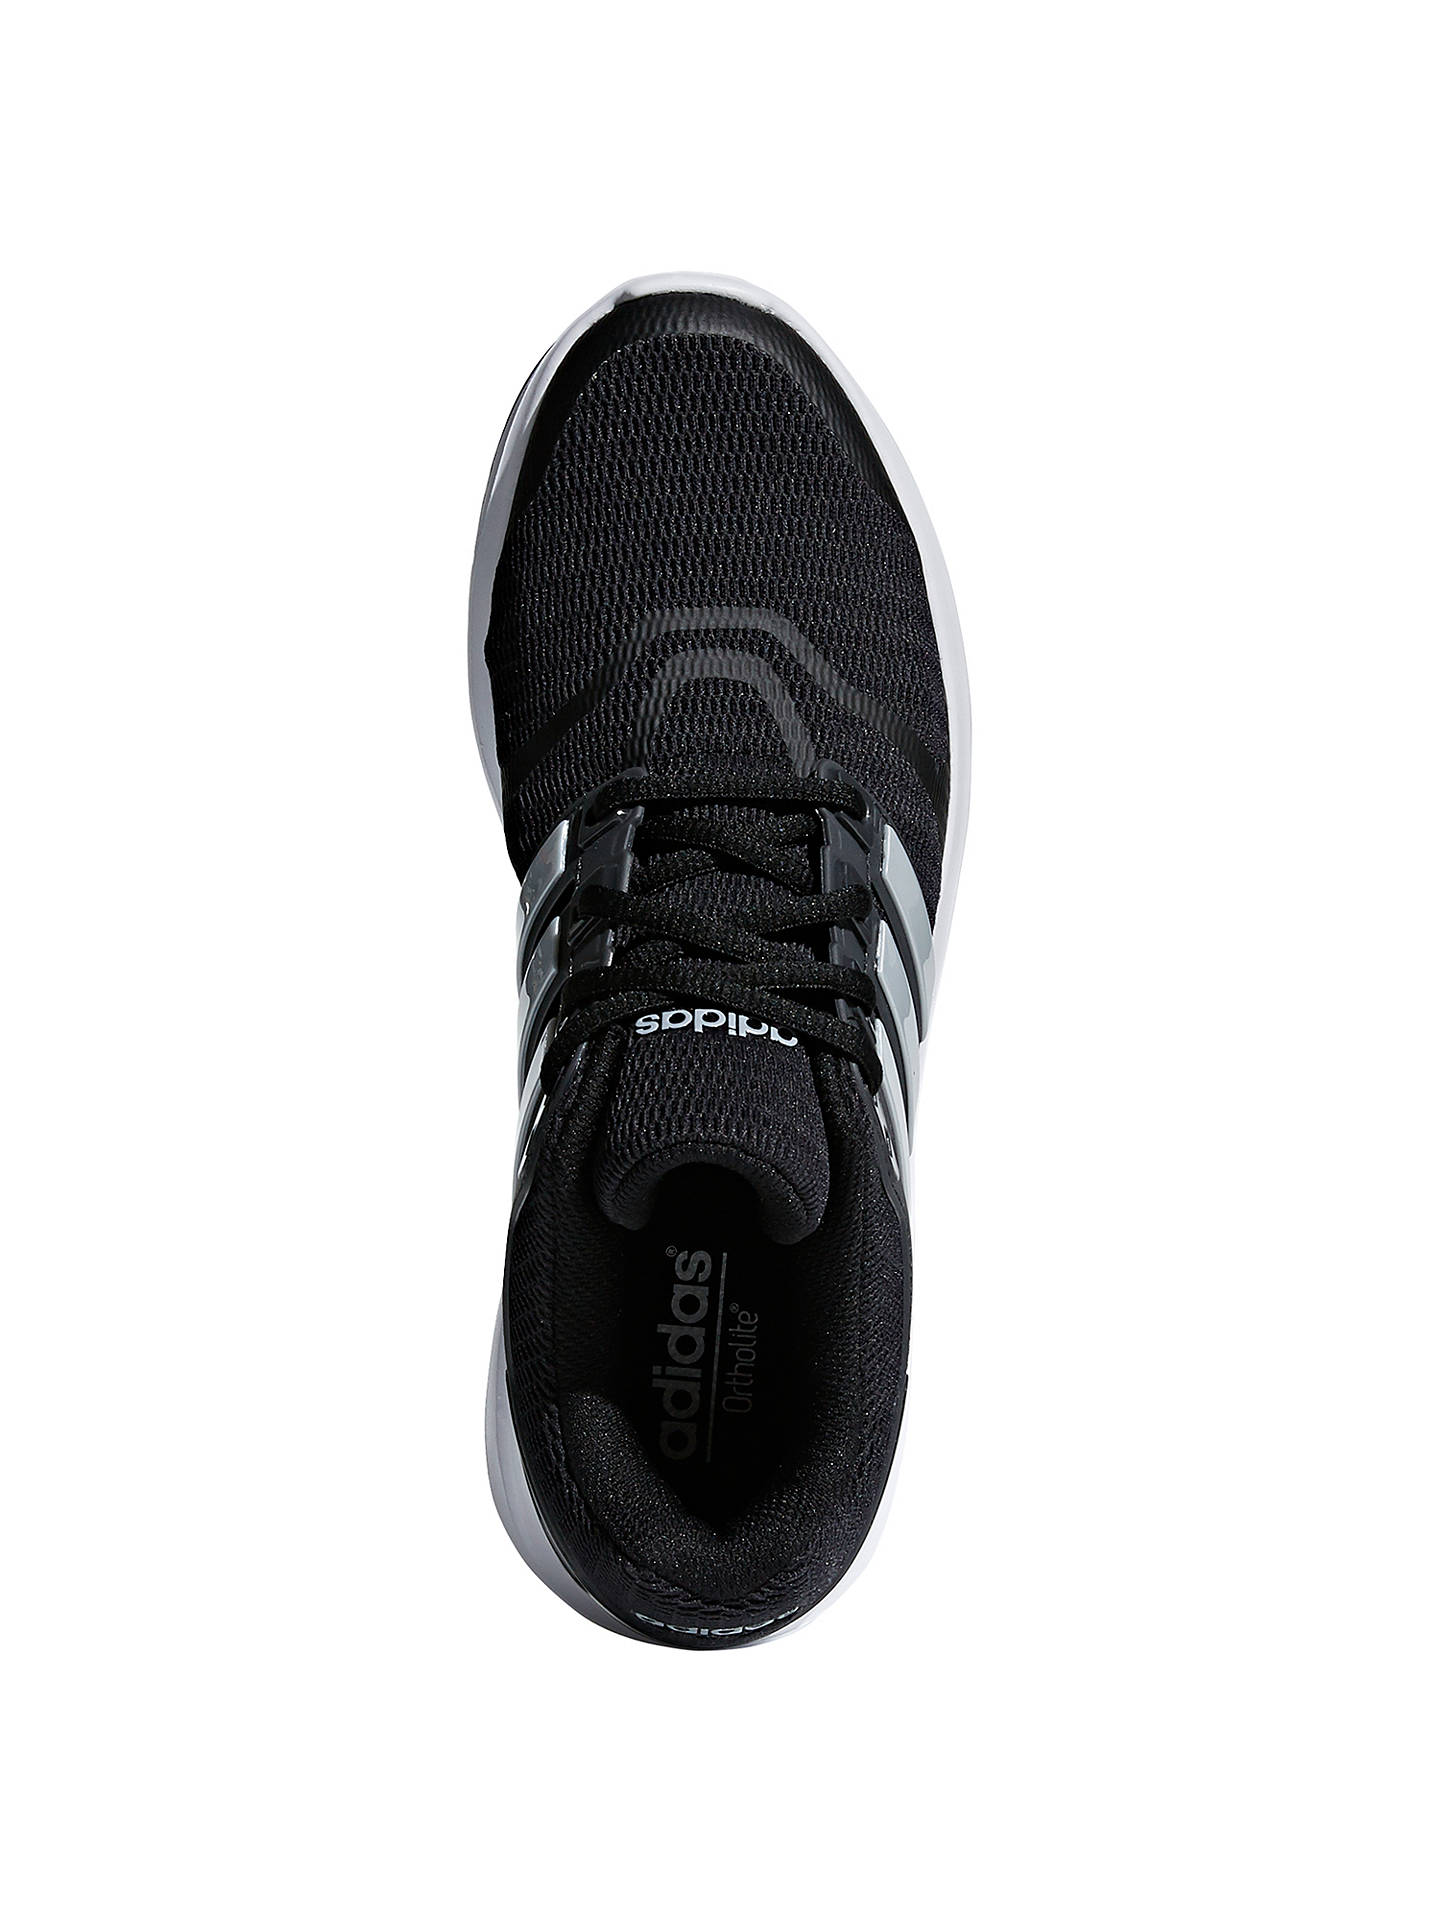 Abundancia Influencia algas marinas  adidas Energy Cloud V Women's Running Shoes at John Lewis & Partners